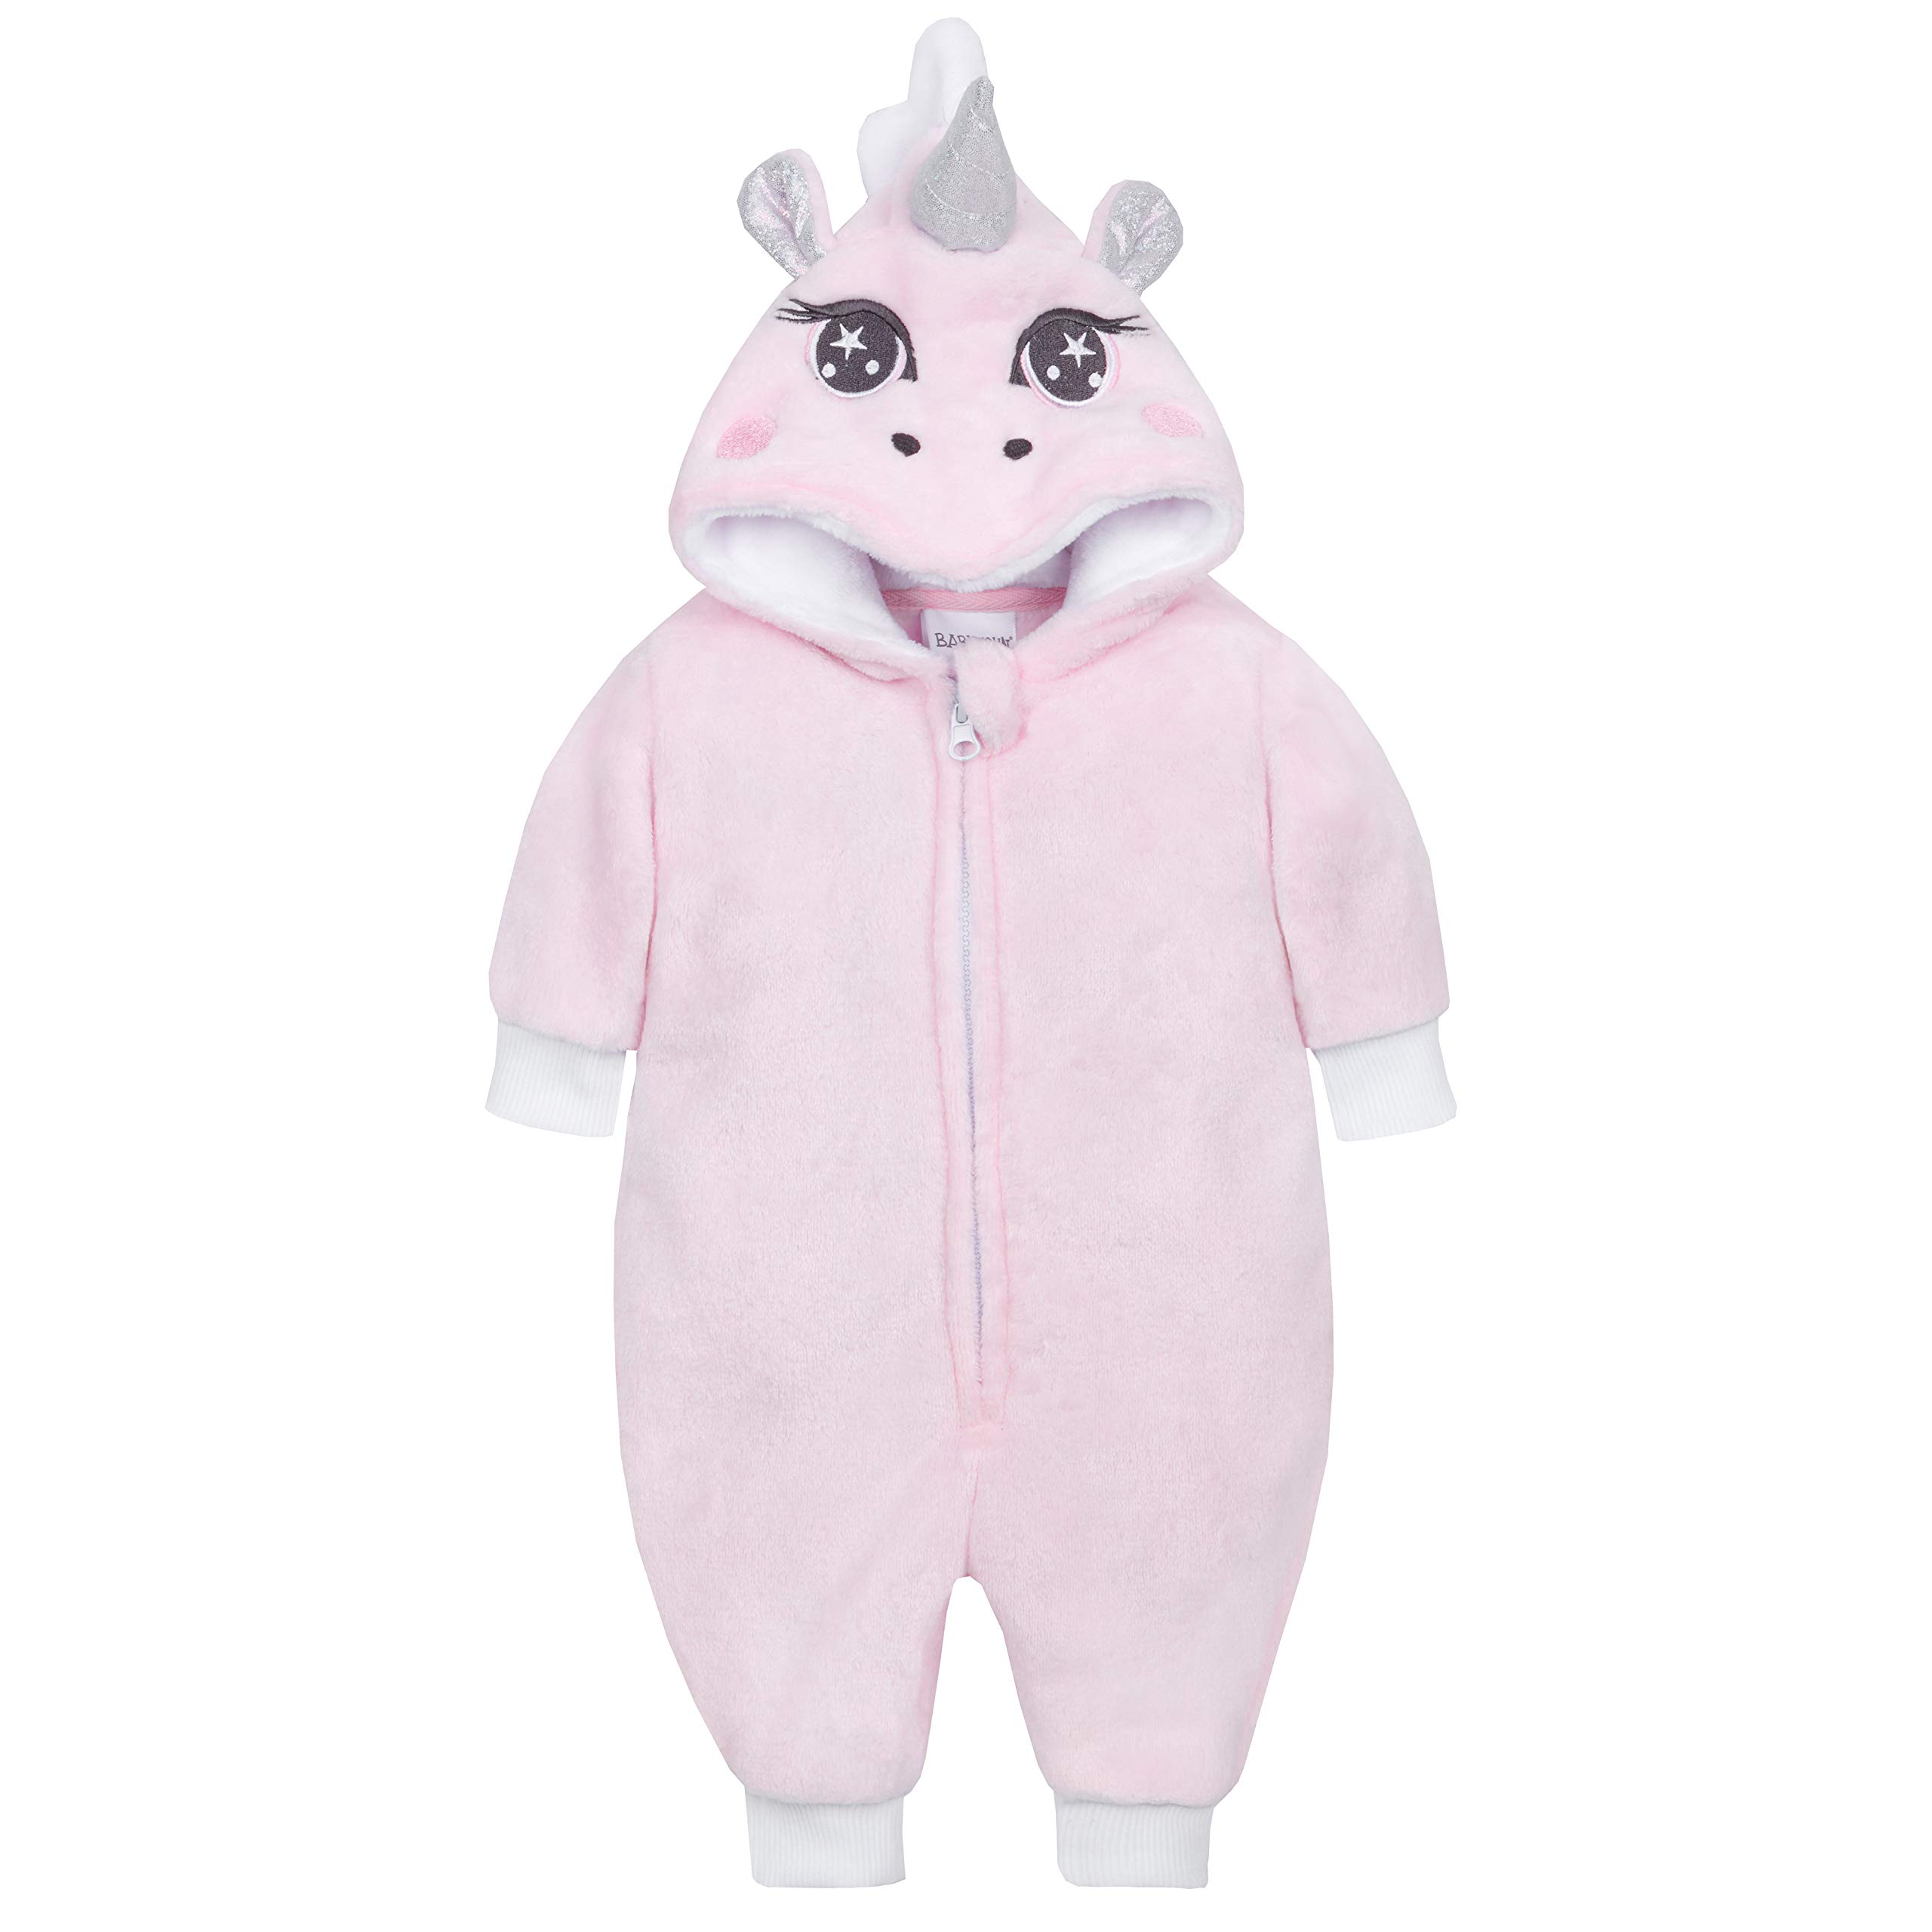 Metzuyan-Baby-Girls-Unicorn-All-in-One-with-Novelty-Hood